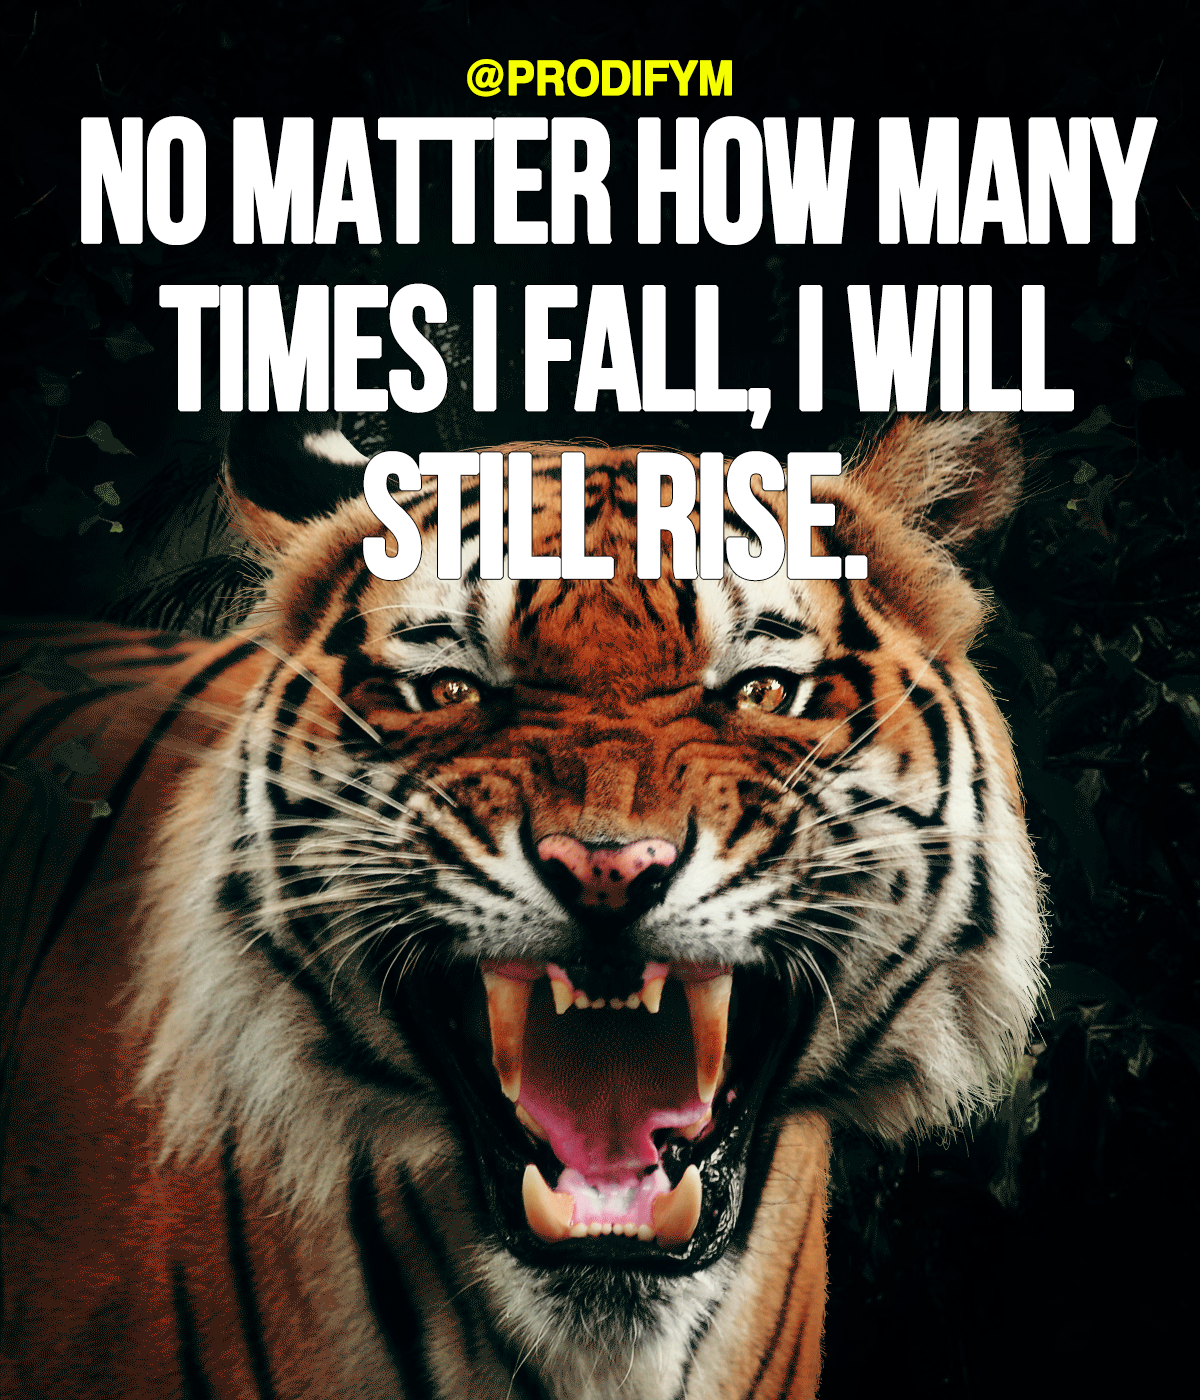 [Image]No matter how many times I fall, I still rise.